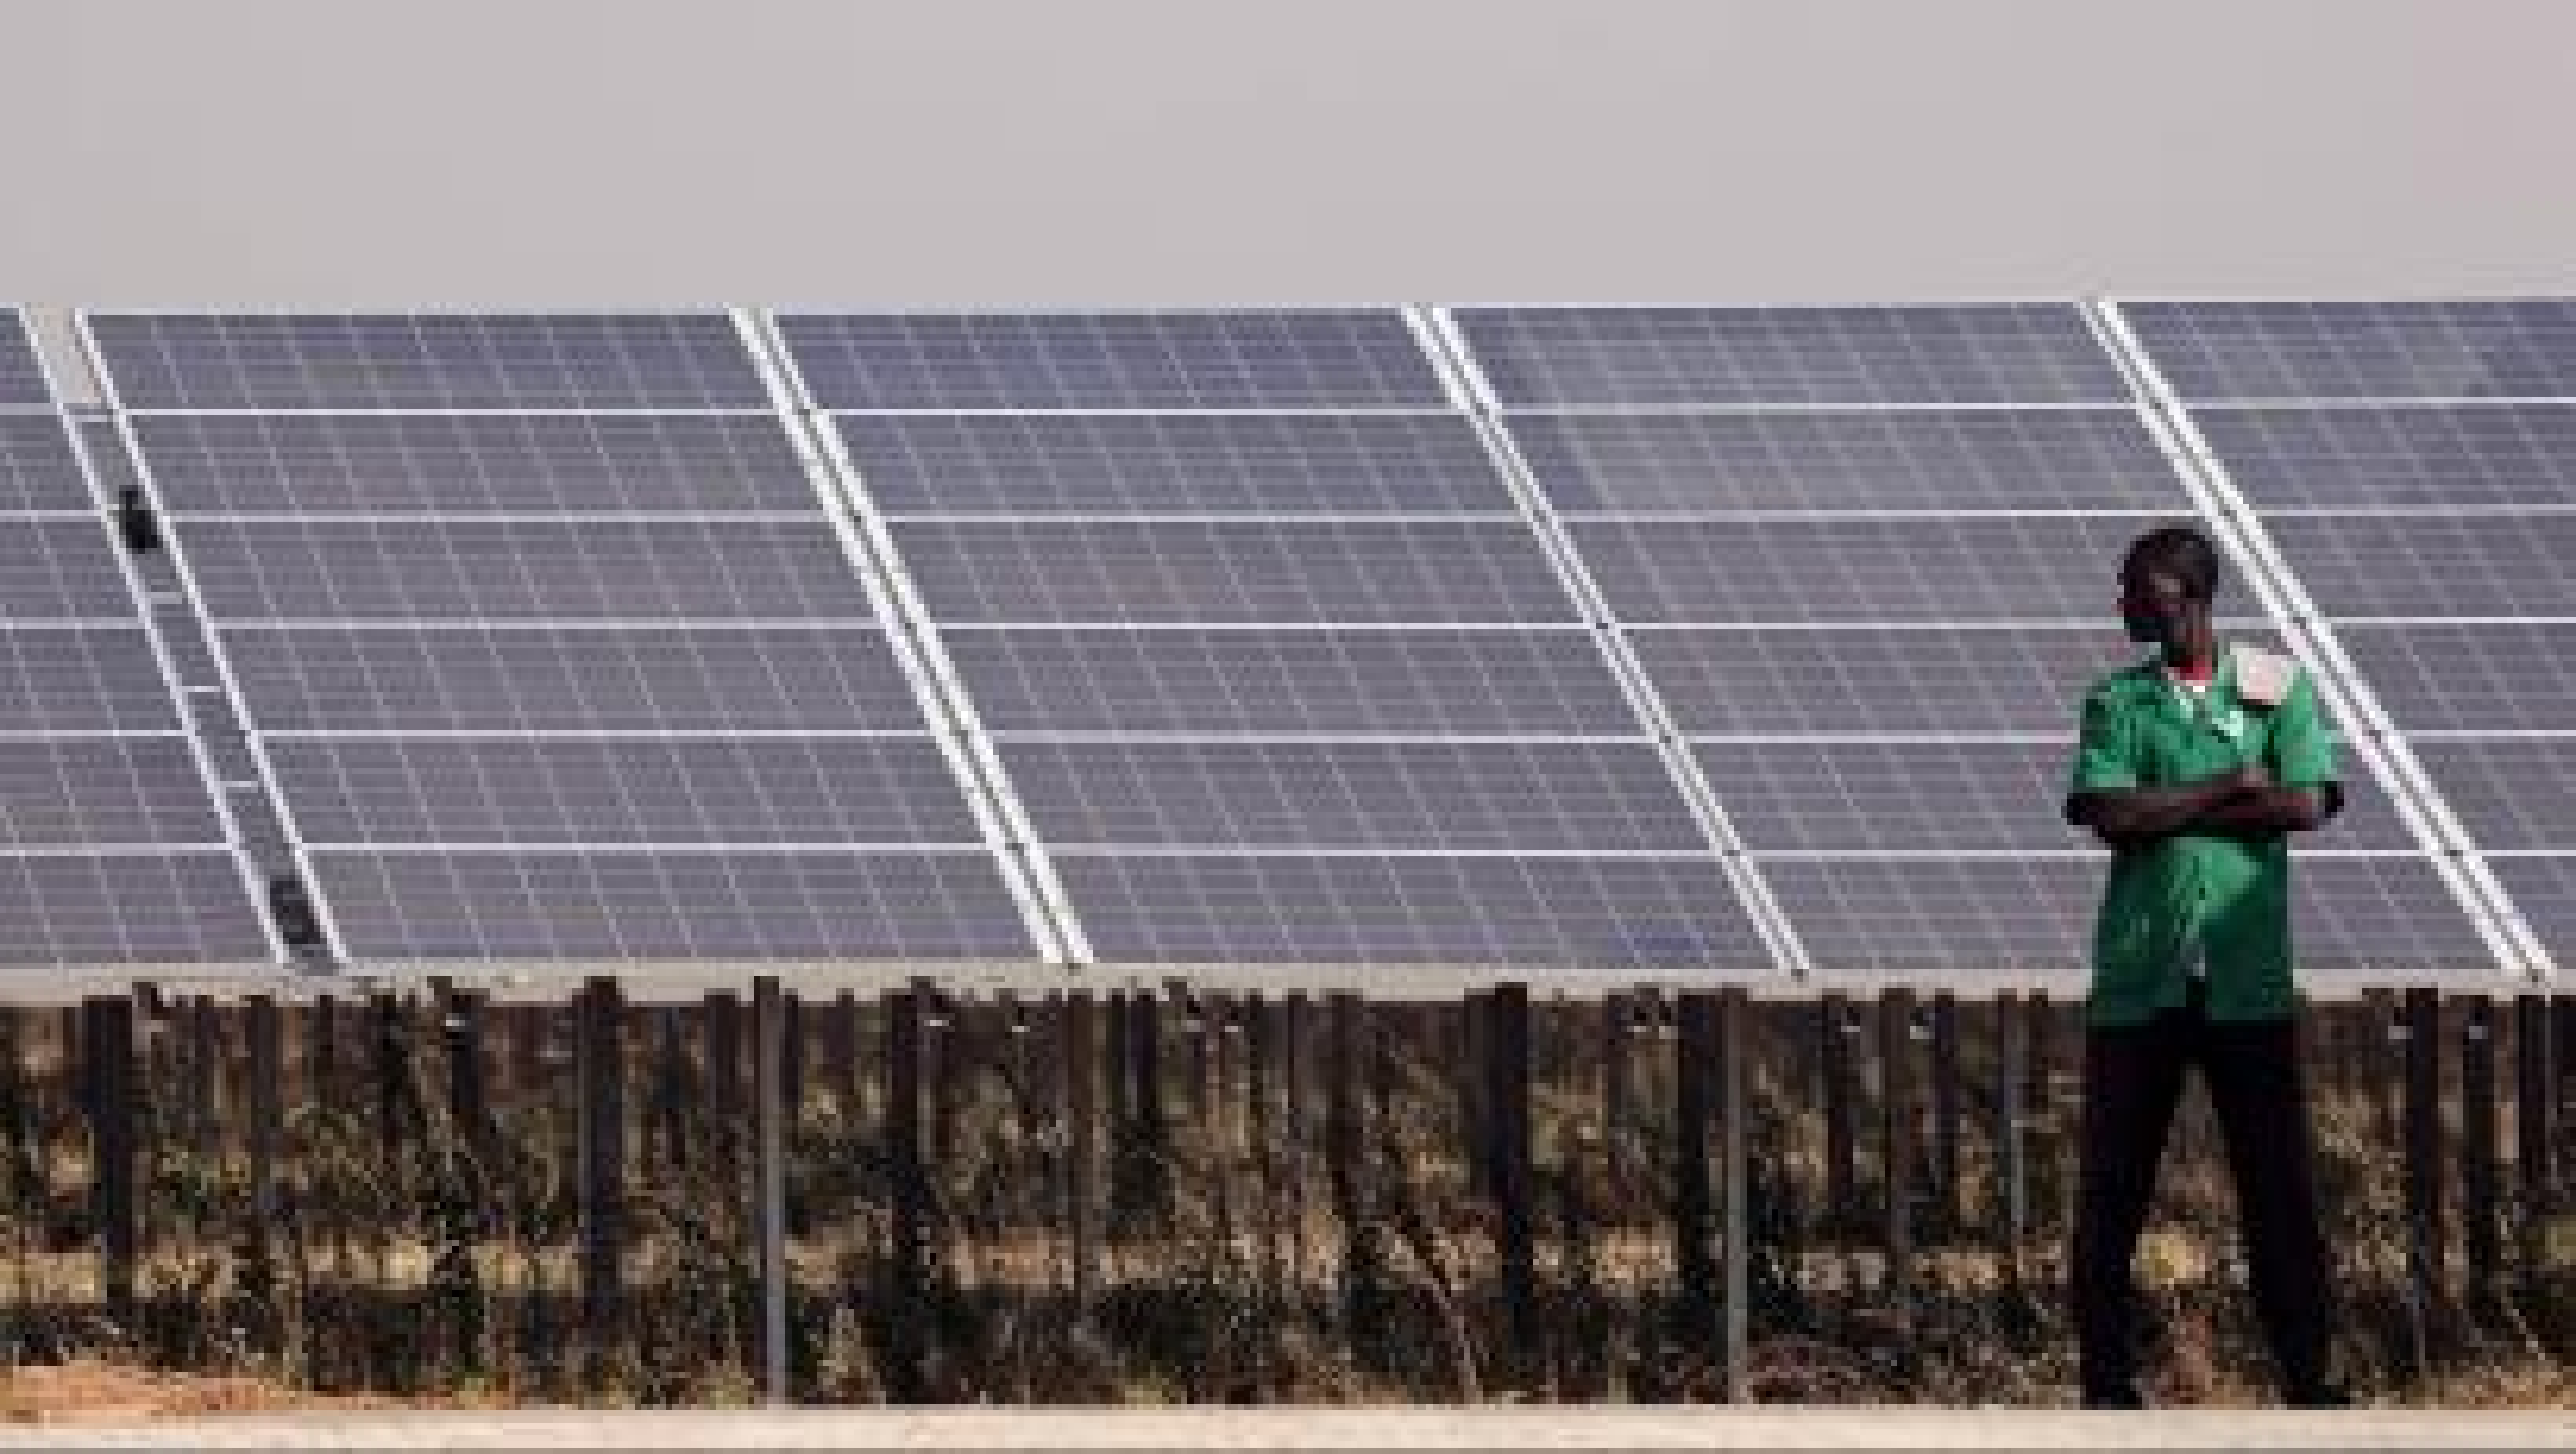 Solar panels are seen during the inauguration ceremony of the solar energy power plant in Zaktubi, near Ouagadougou, Burkina Faso, November 29, 2017